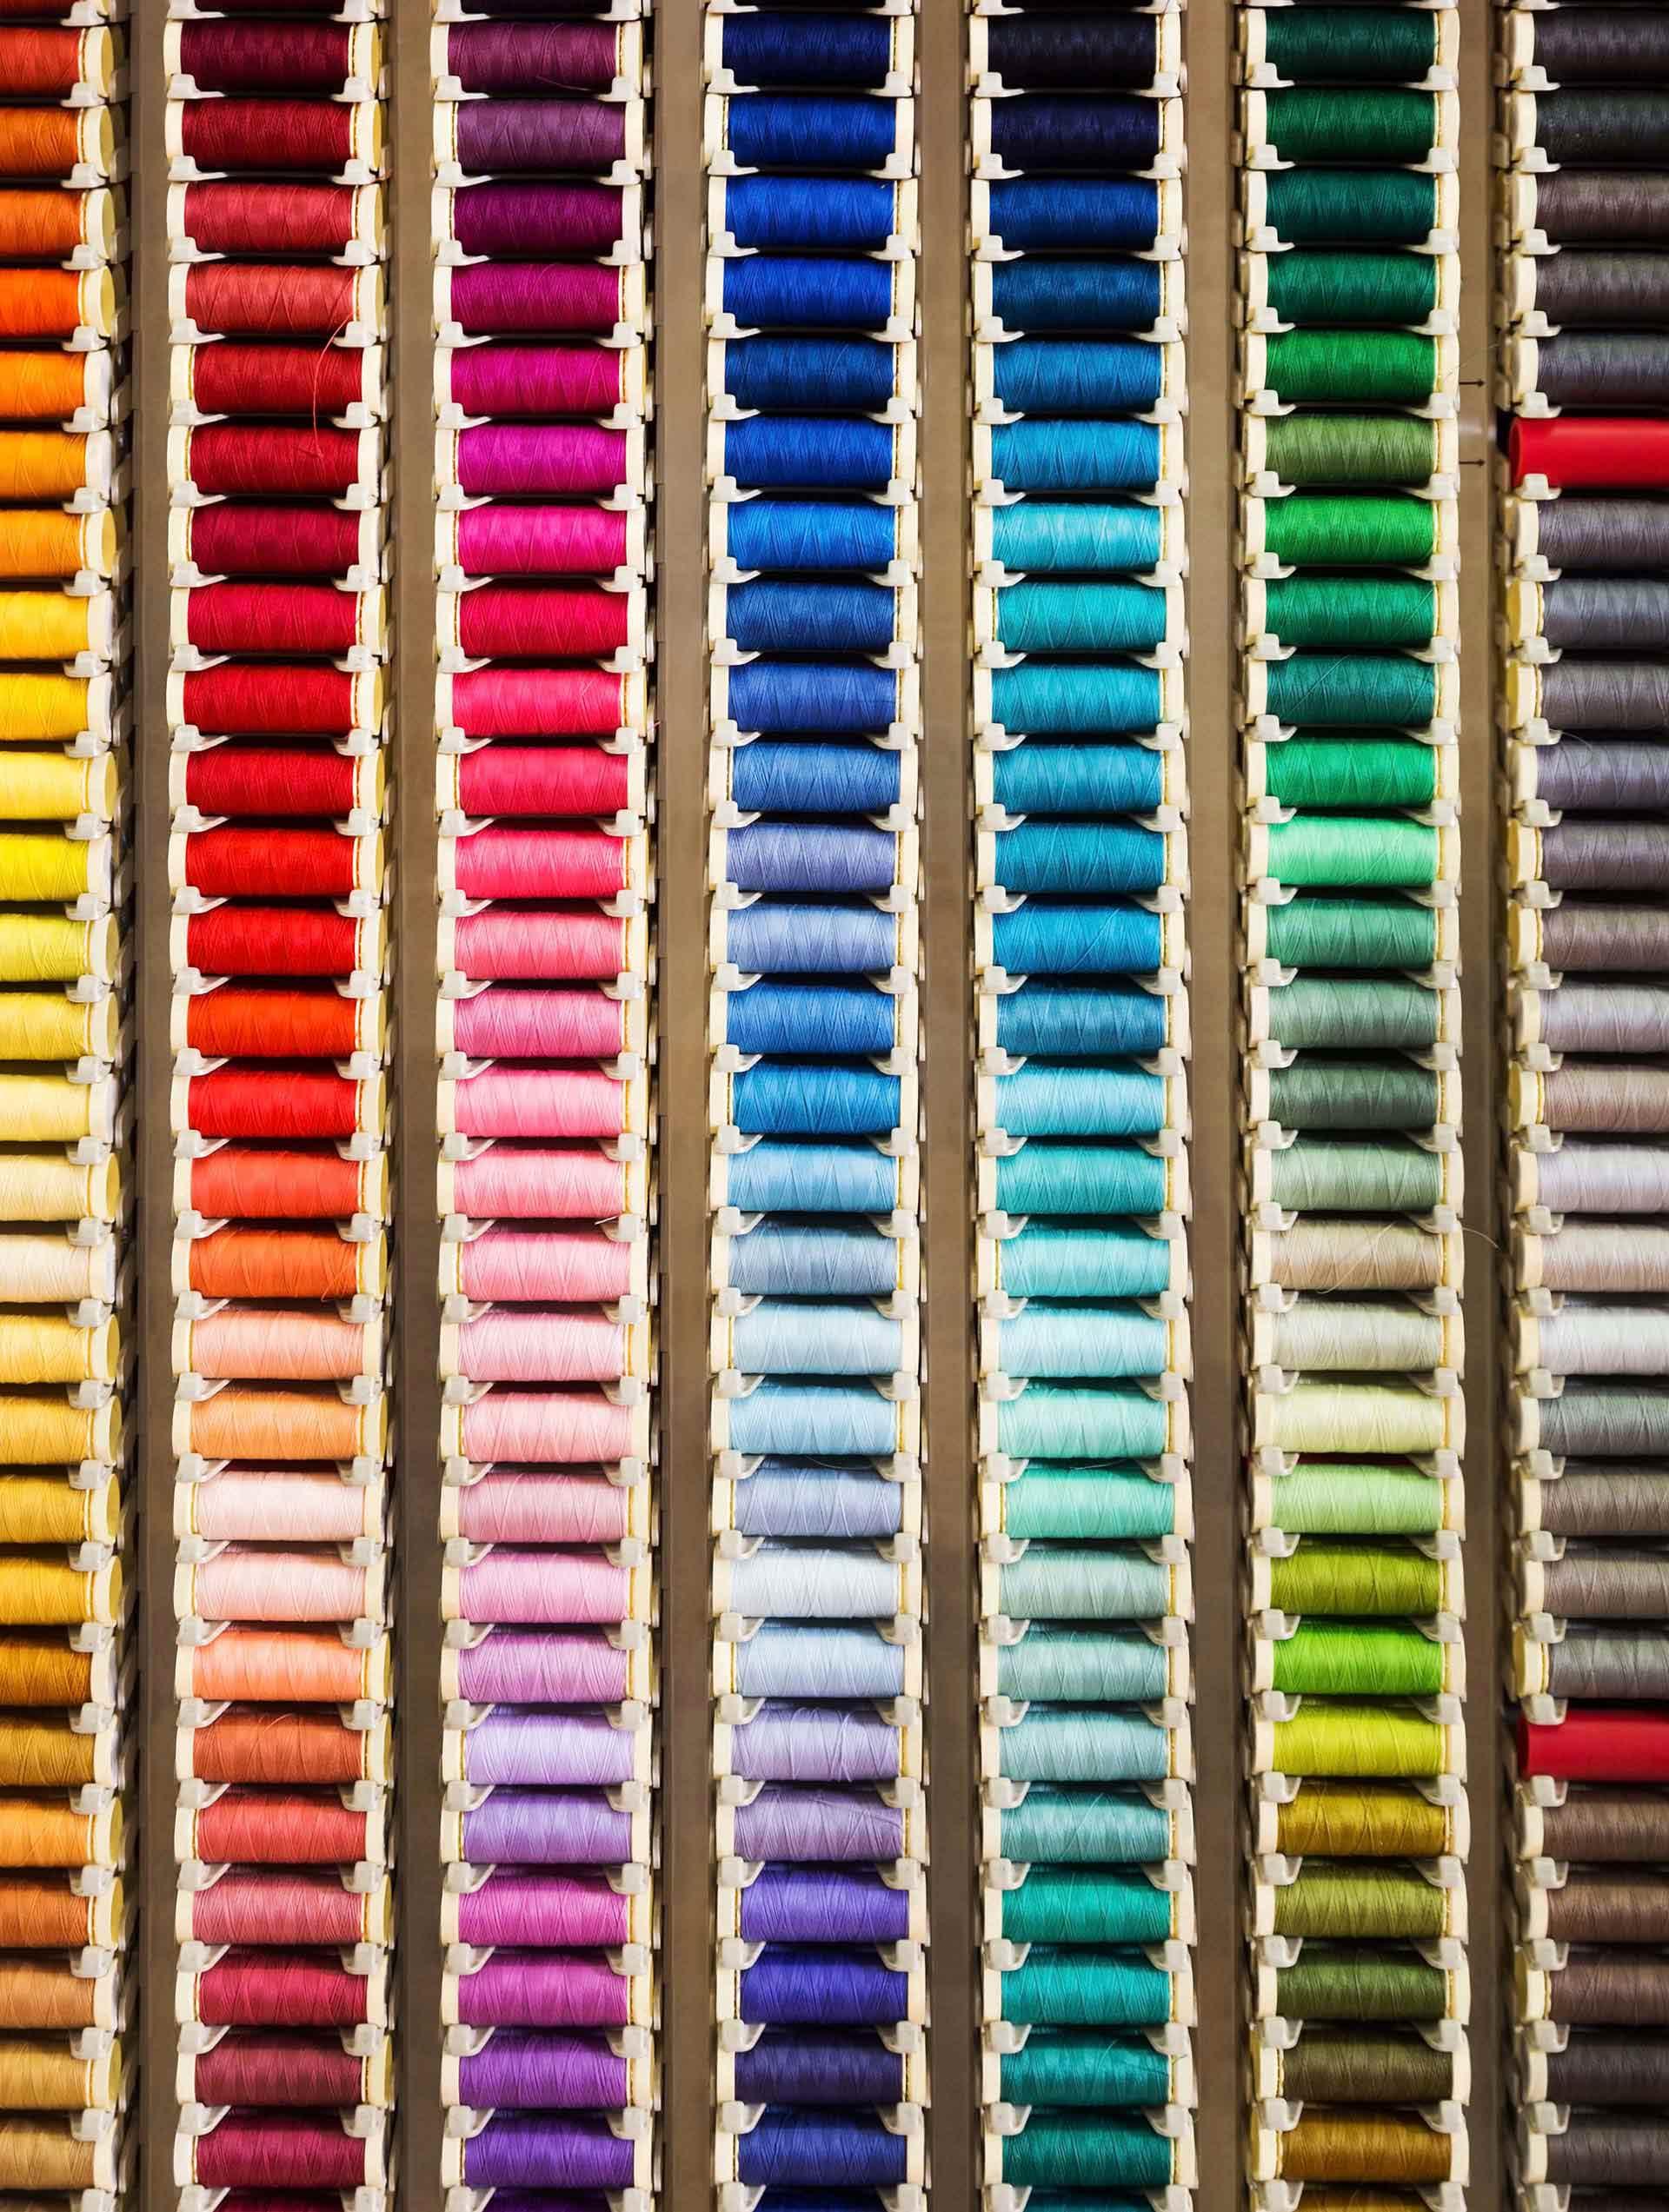 Fichas técnicas de los productos en el sector textil